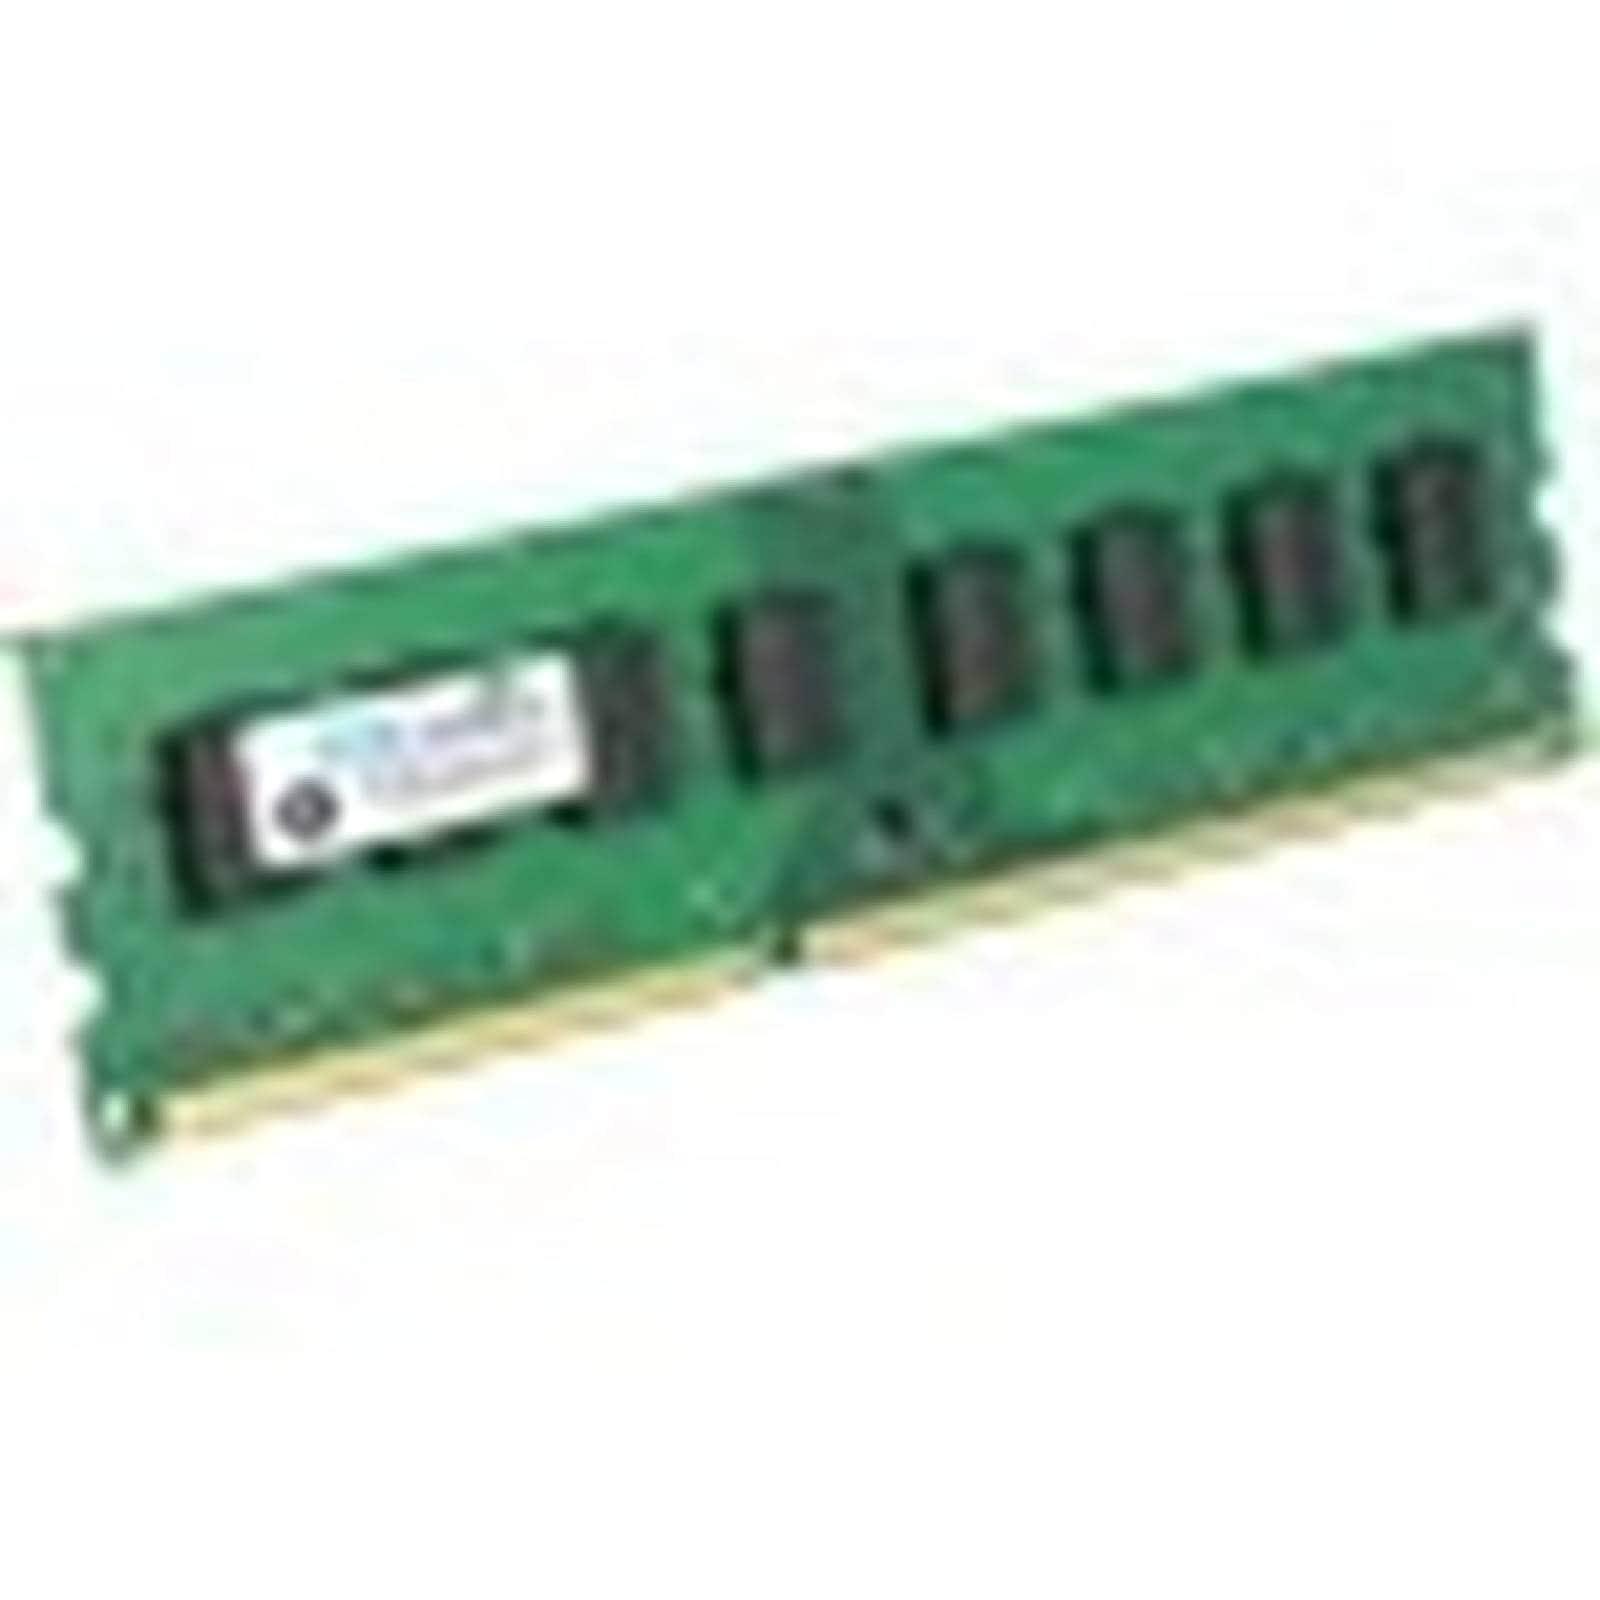 EDGE 8GB (2X4GB) PC38500 KIT SIN DOBLADOR DDR3 DE 240 PIN (TS)